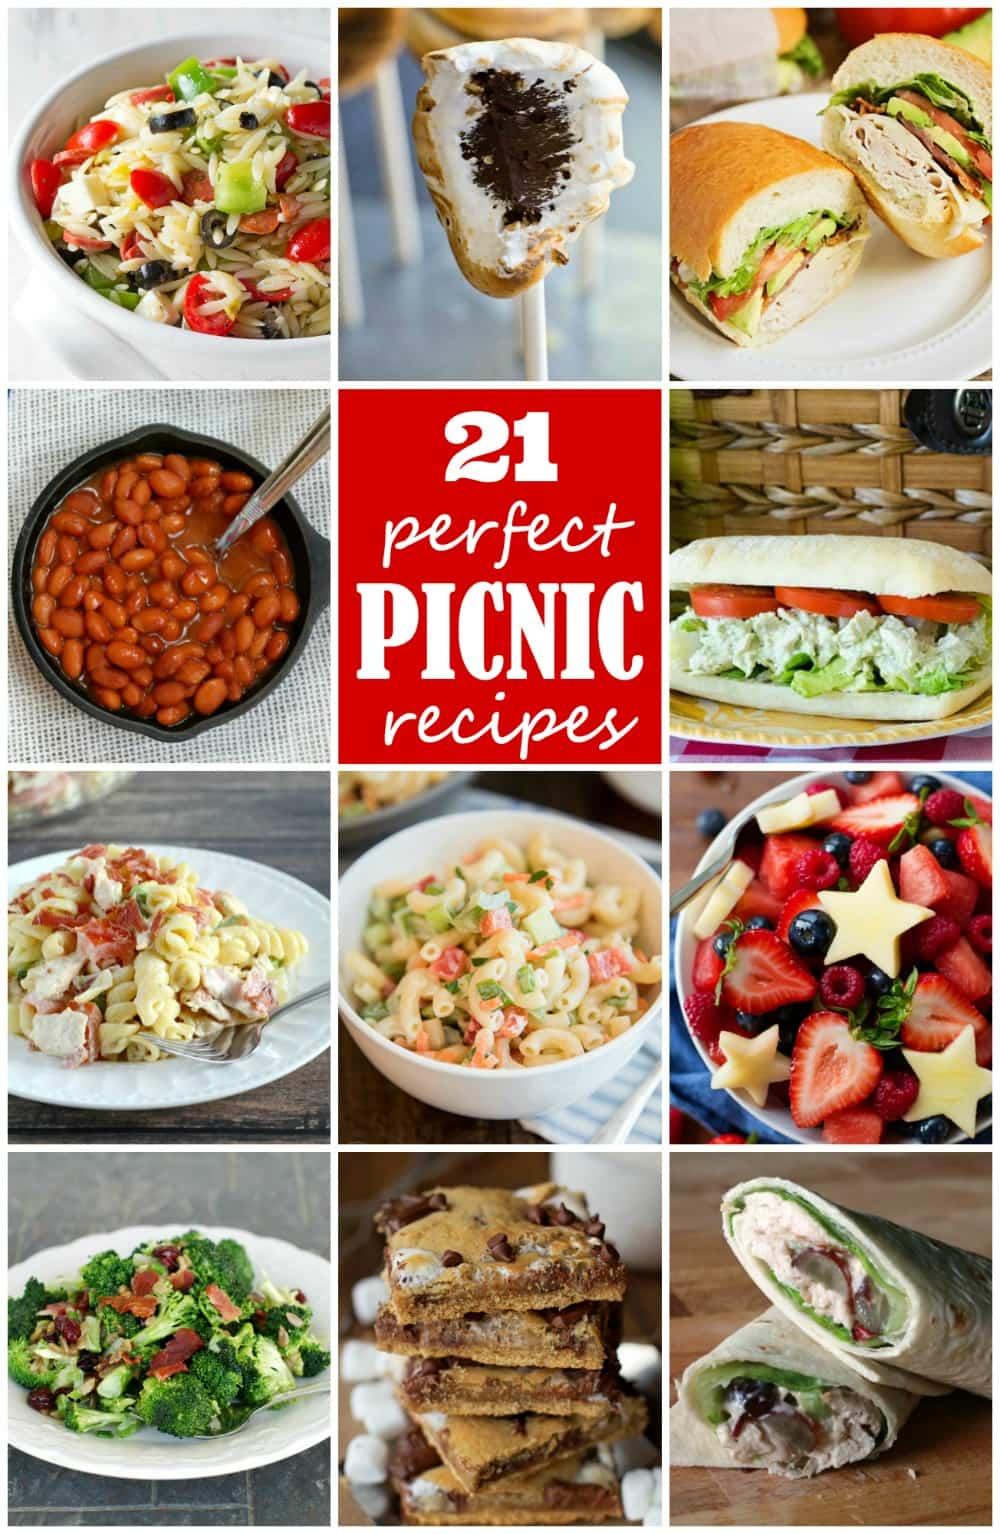 21+ Amazing Picnic Recipes for you next picnic!